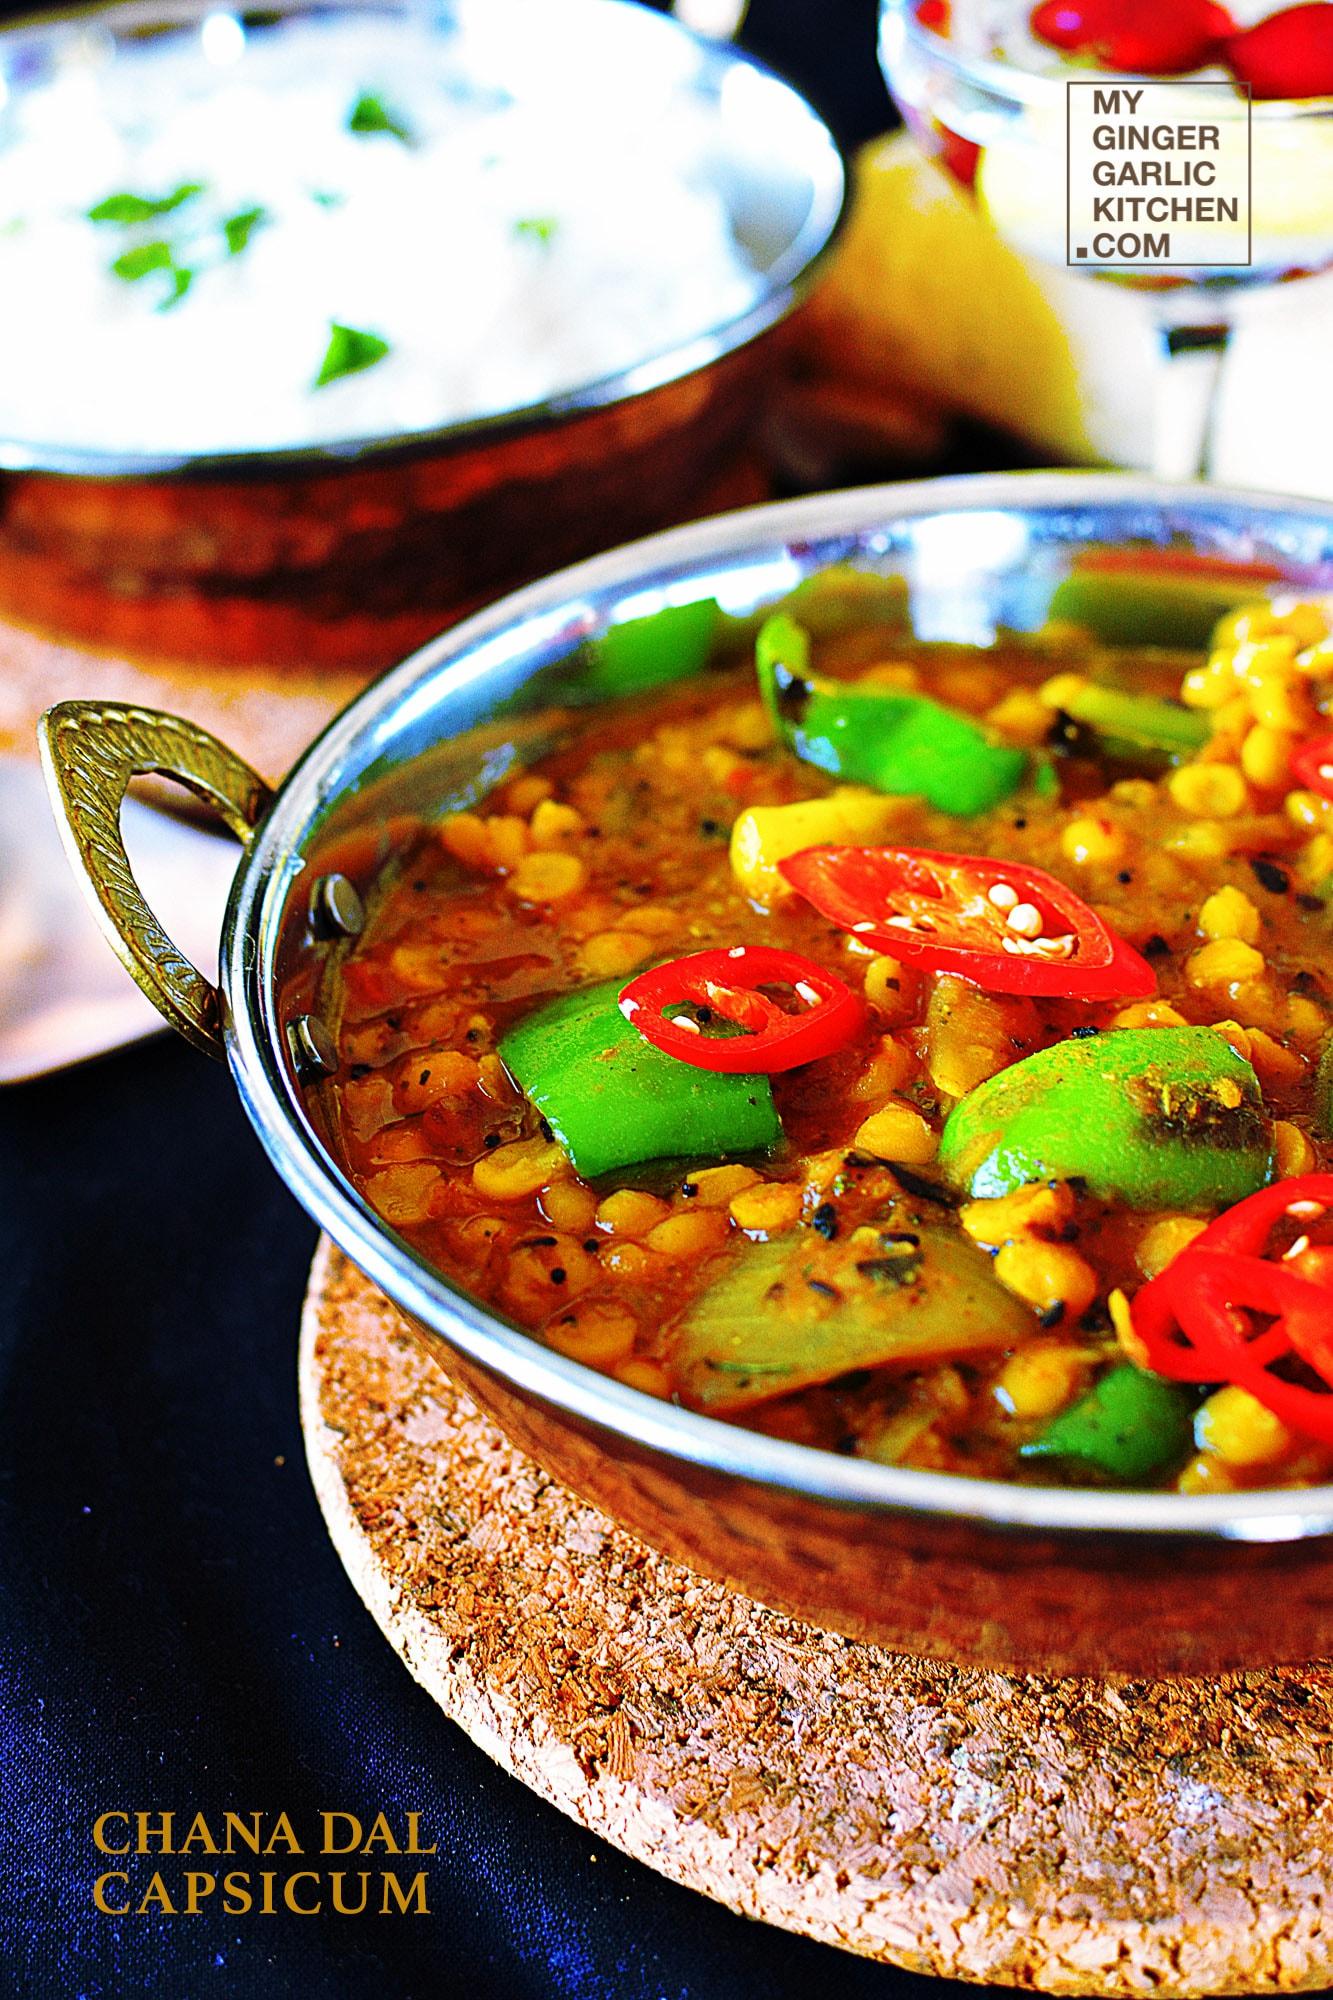 Image - recipe chana dal capsicum curry anupama paliwal my ginger garlic kitchen 10 682x1024